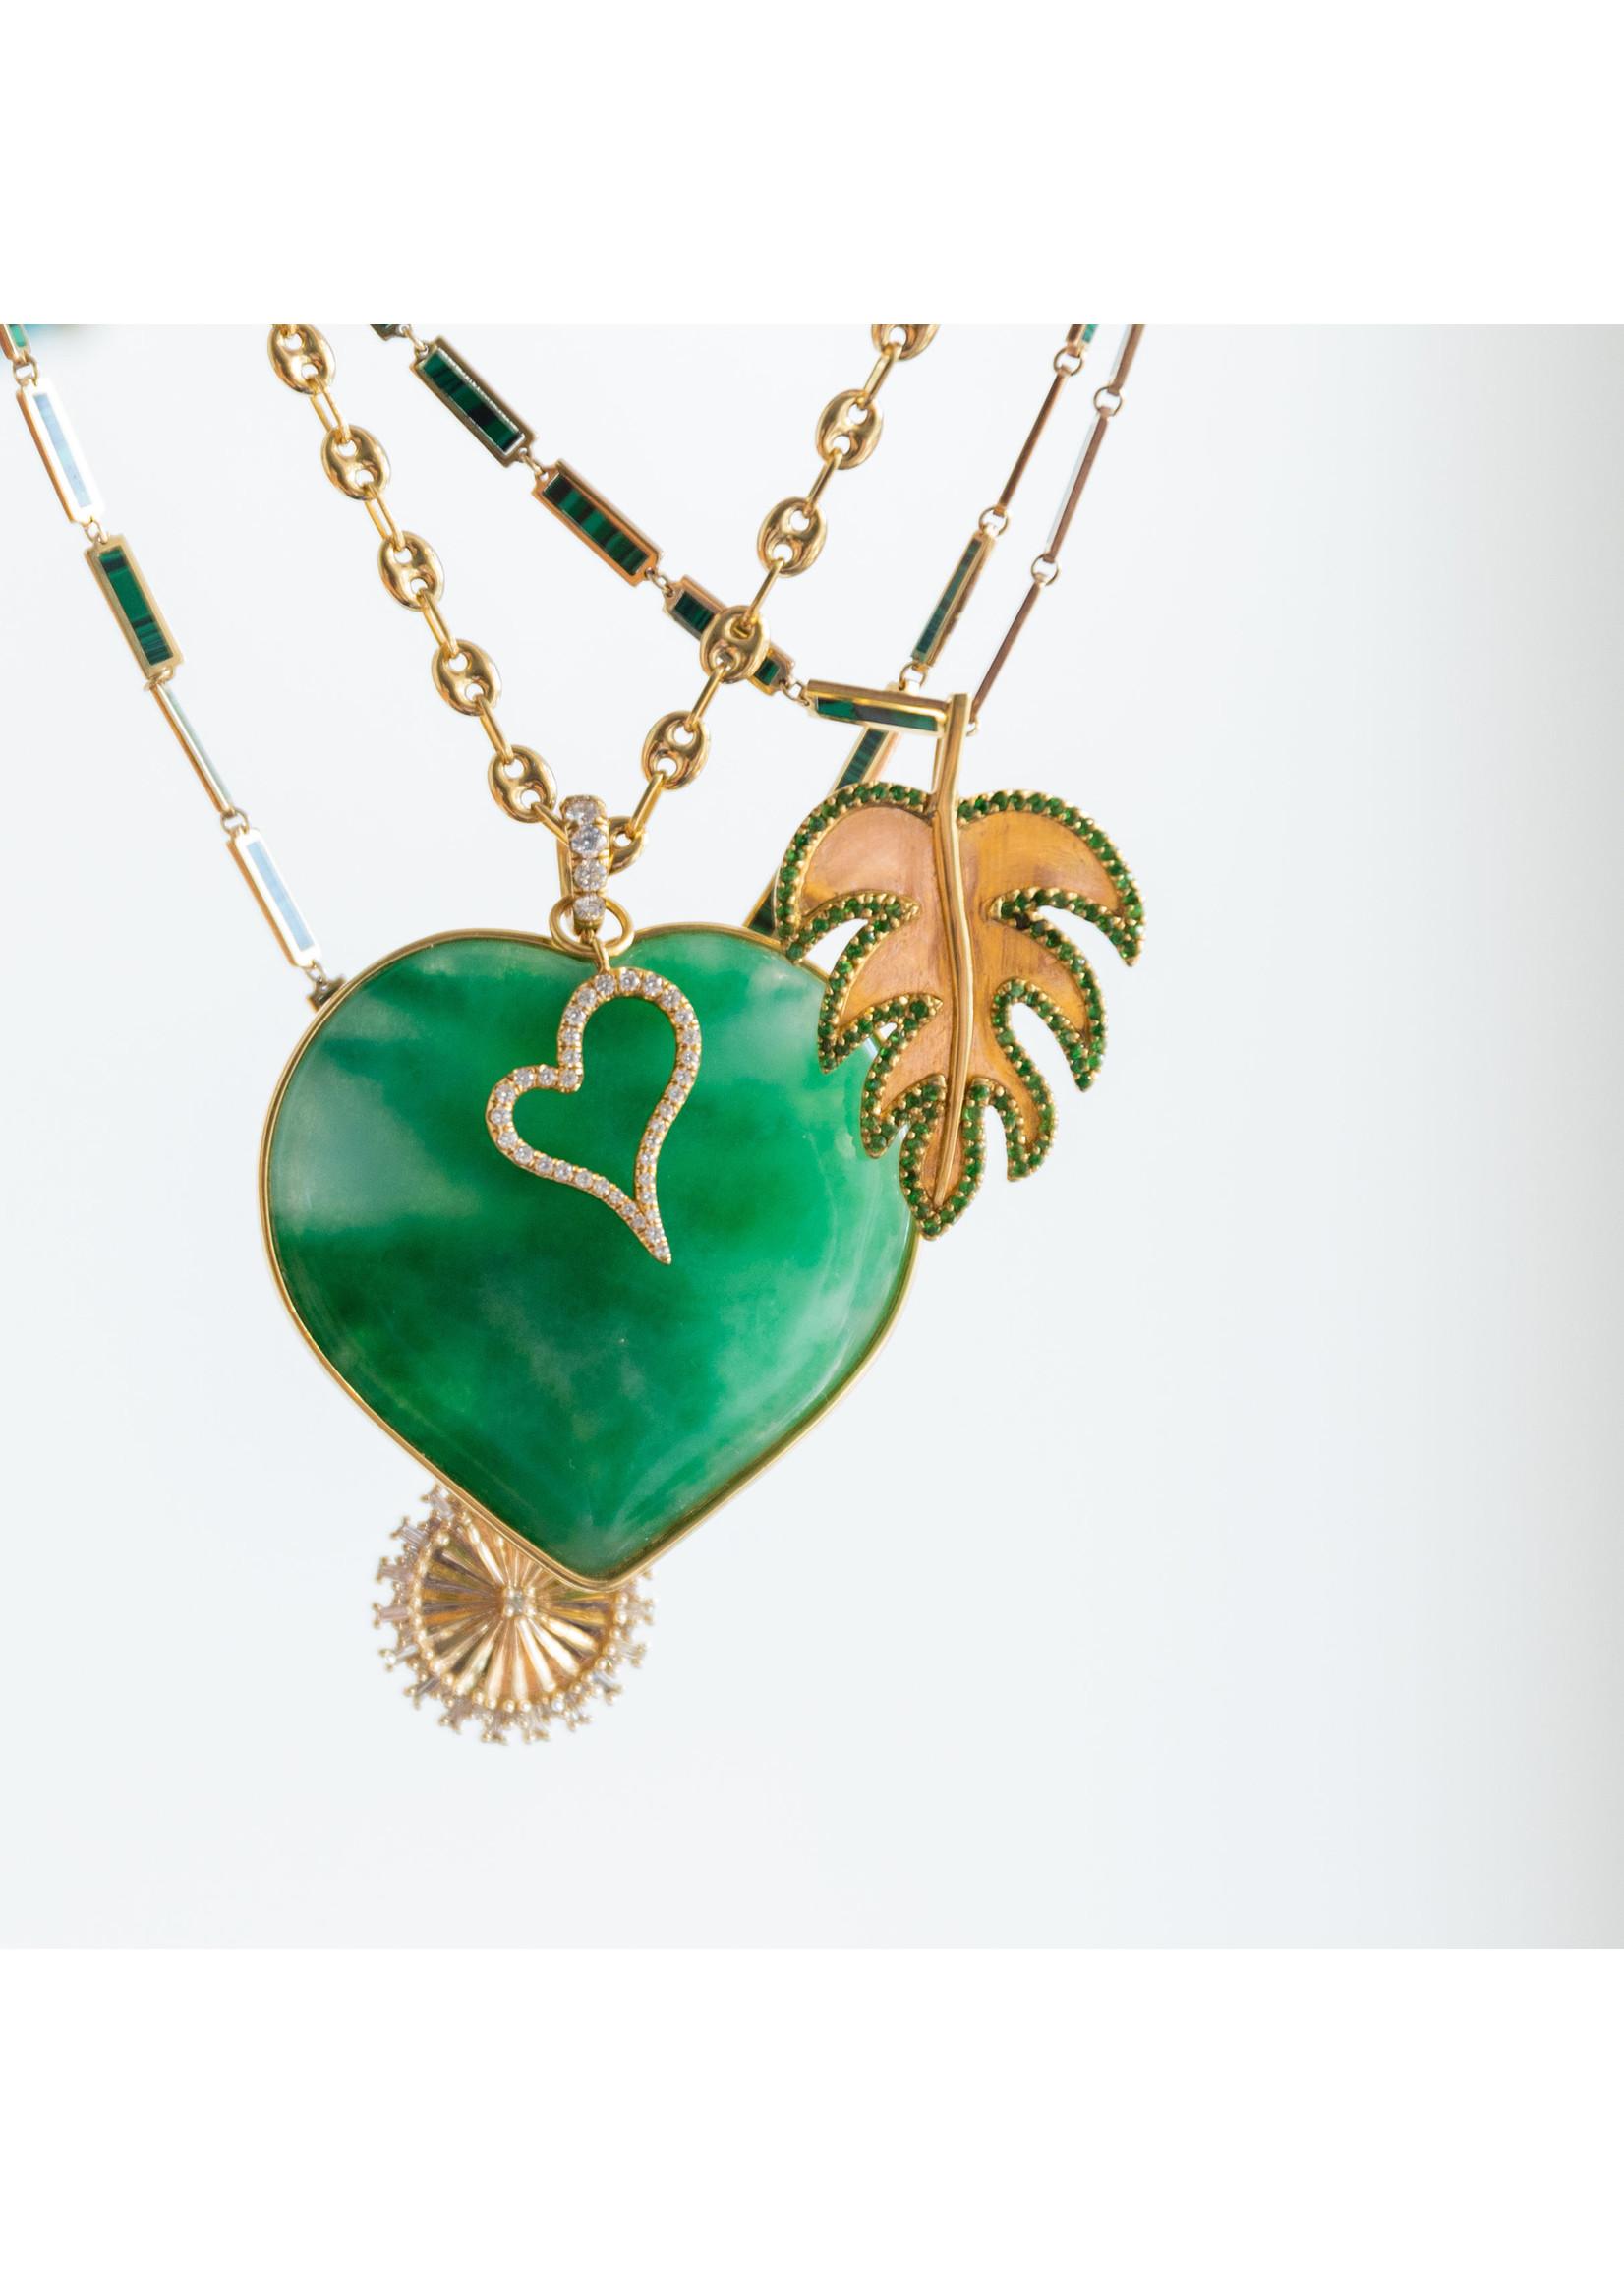 Have a Heart Adam's Rib Charm with Tsavorite